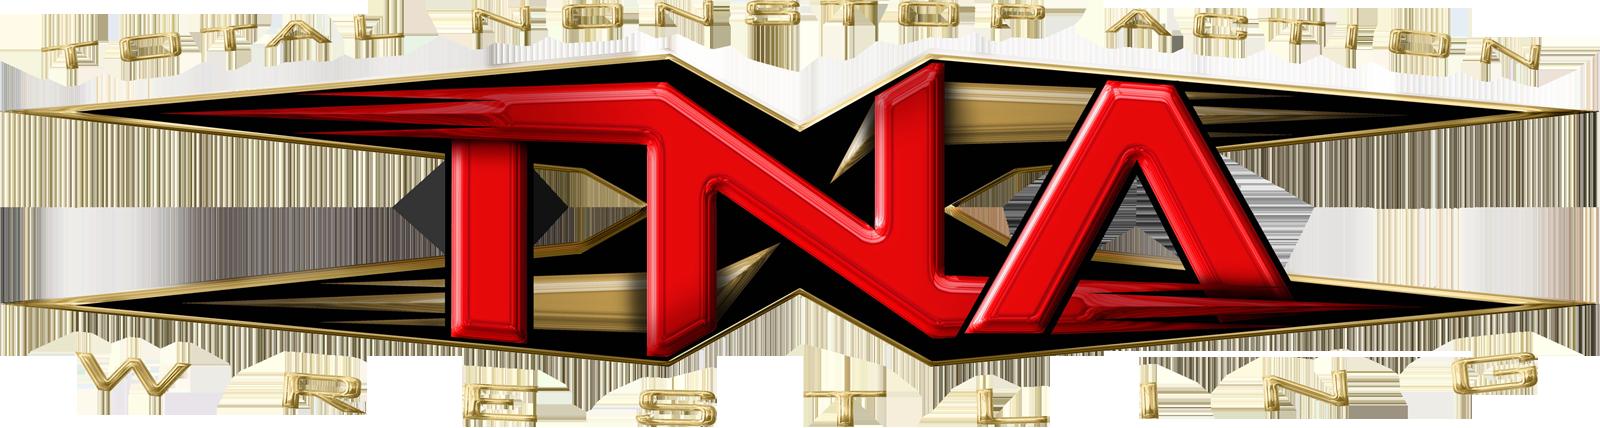 Impact Wrestling (company).